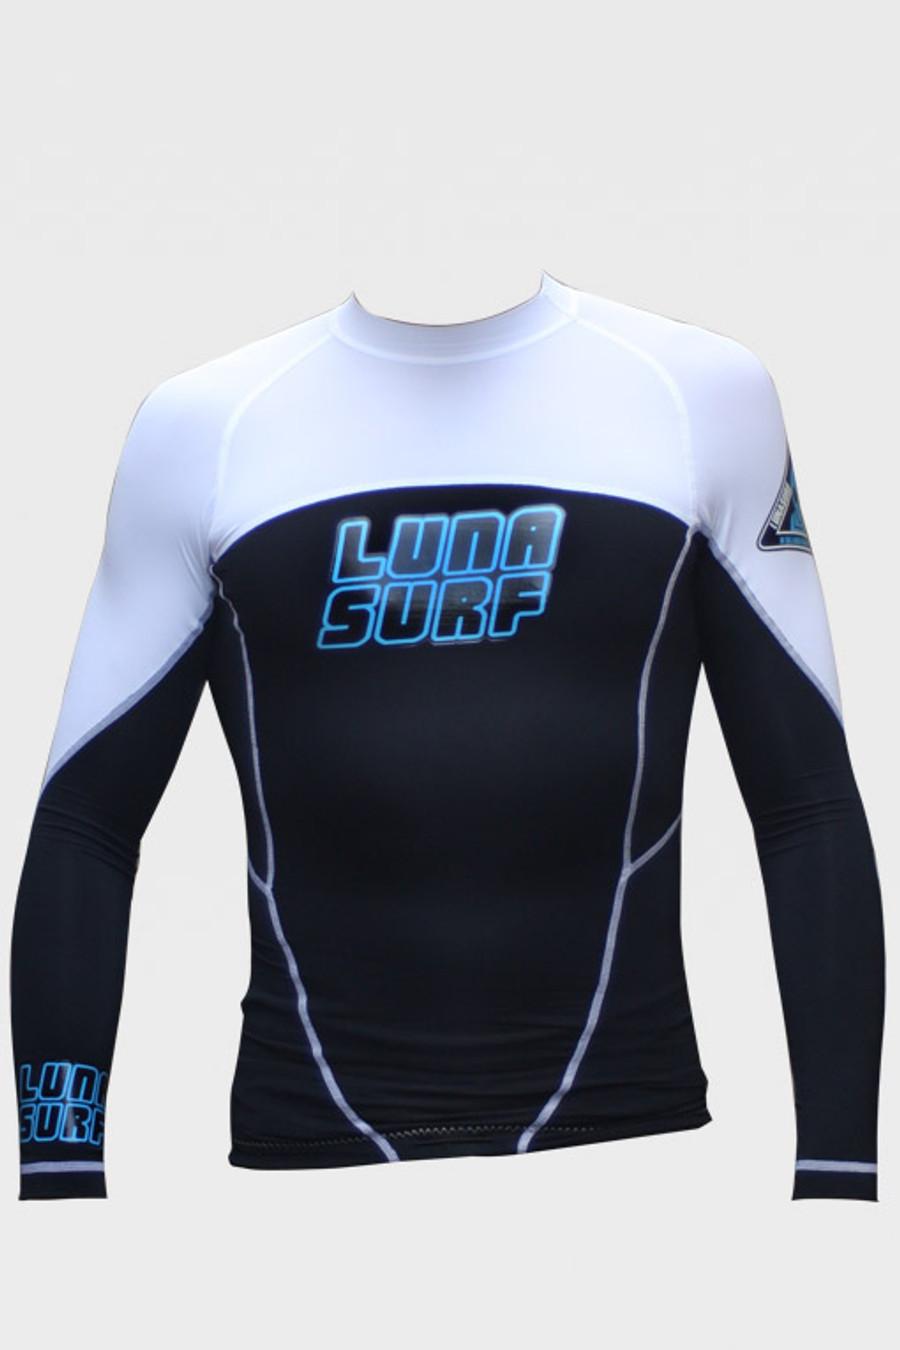 Lunasurf Mens Long Sleeved Indo Rashie White Black